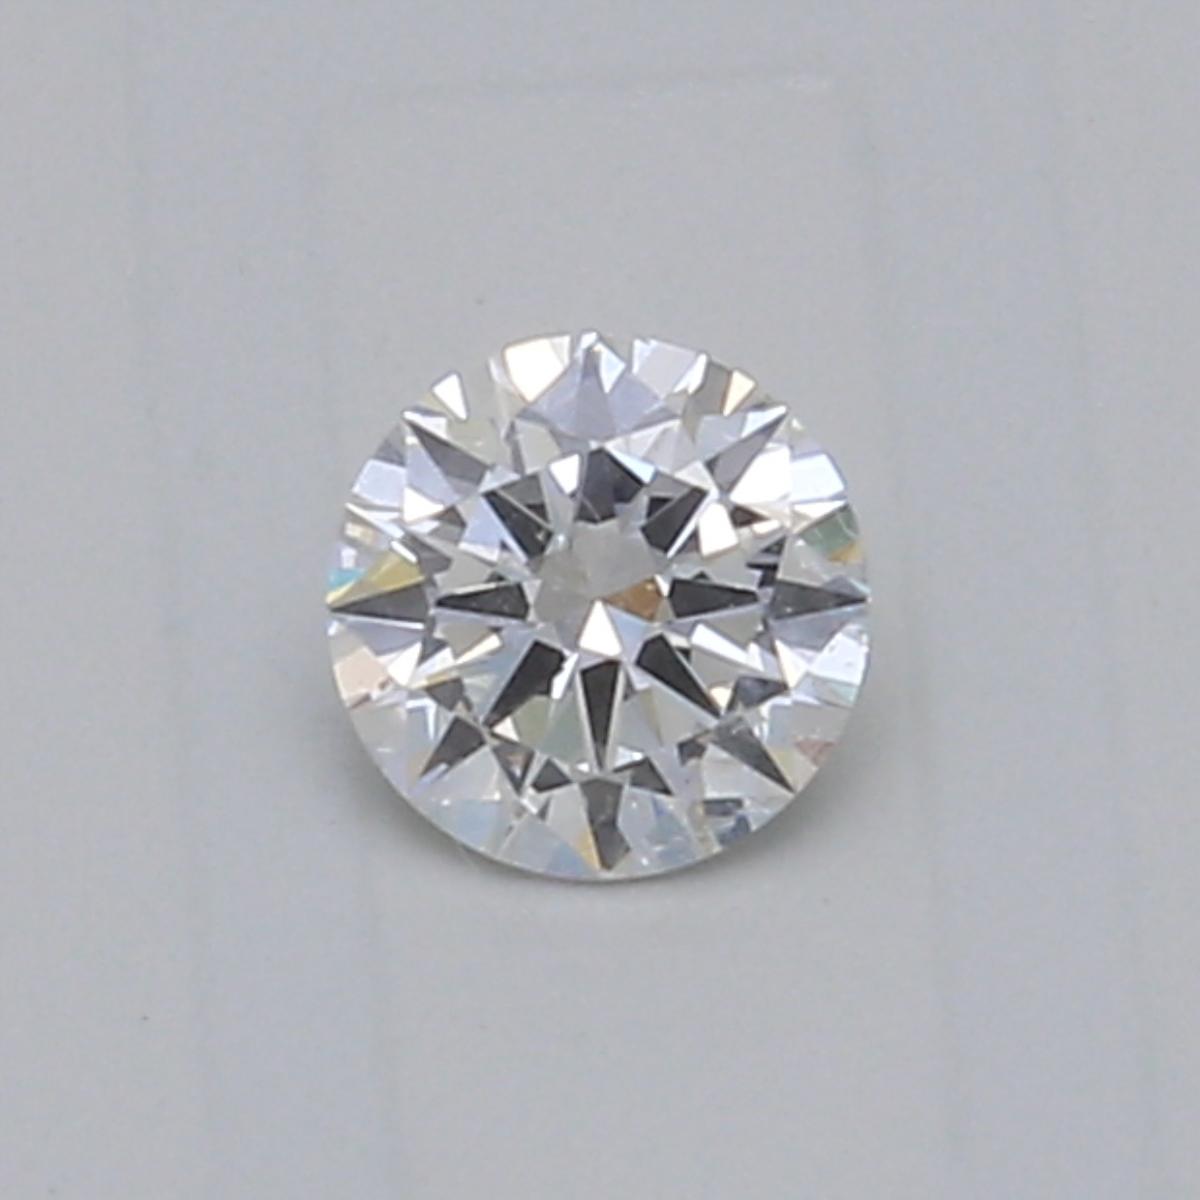 0.40 Carat F SI2 Round Diamond